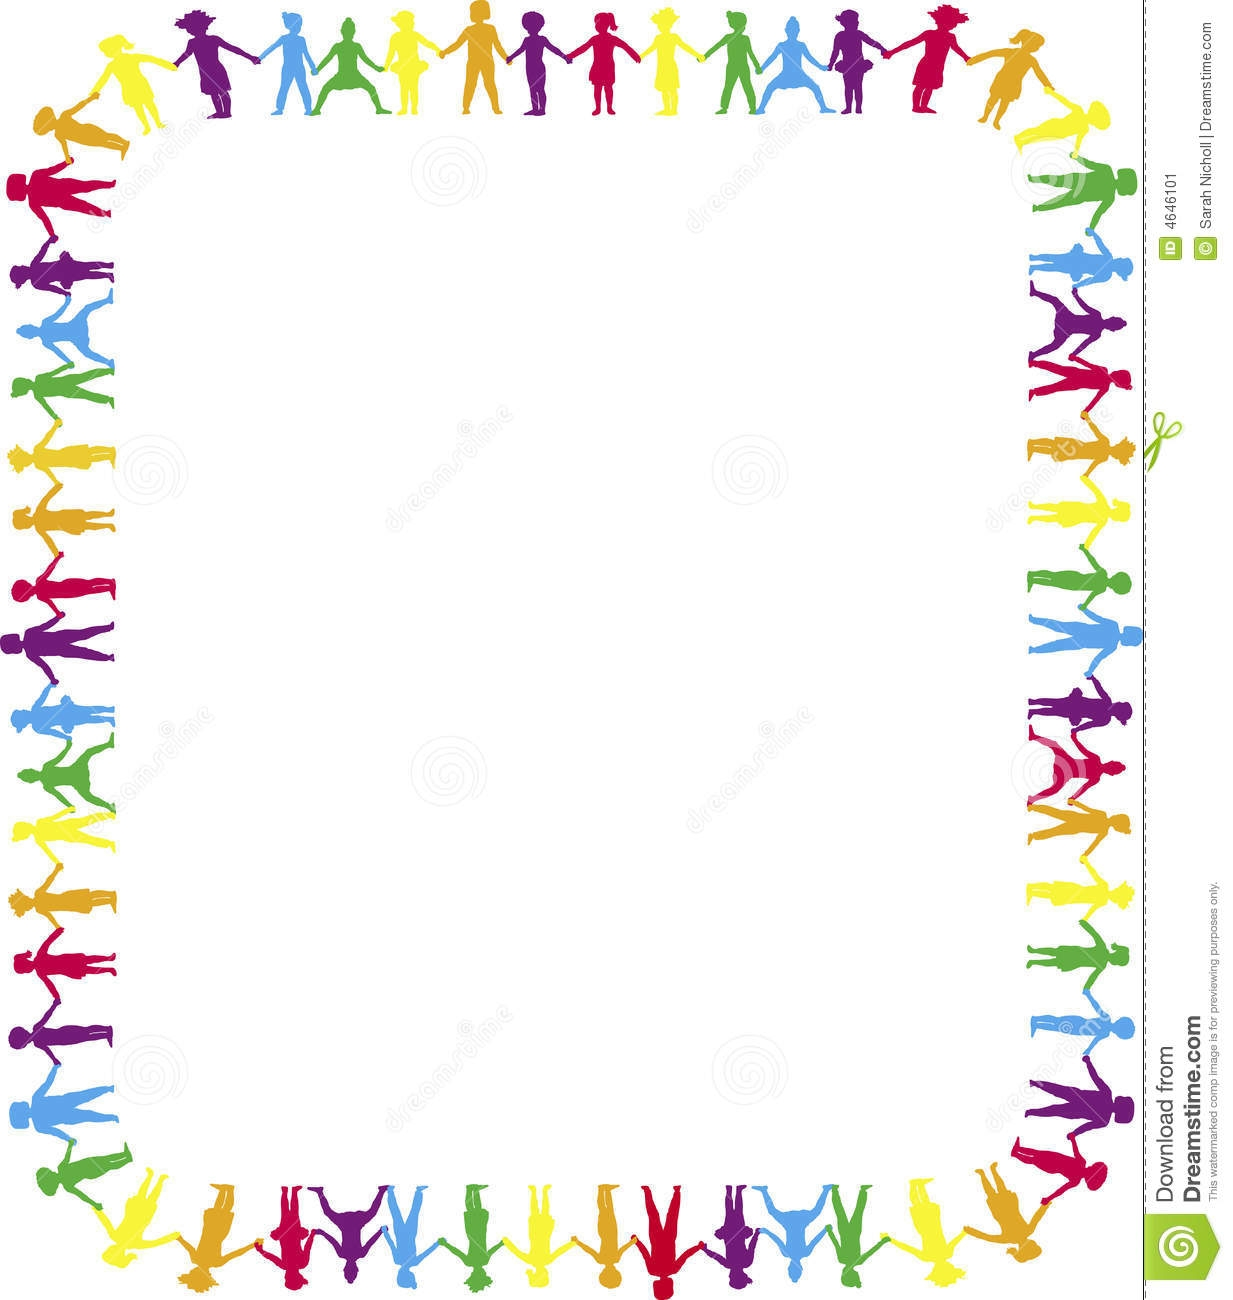 1233x1300 Kids Holding Hands Clipart Border